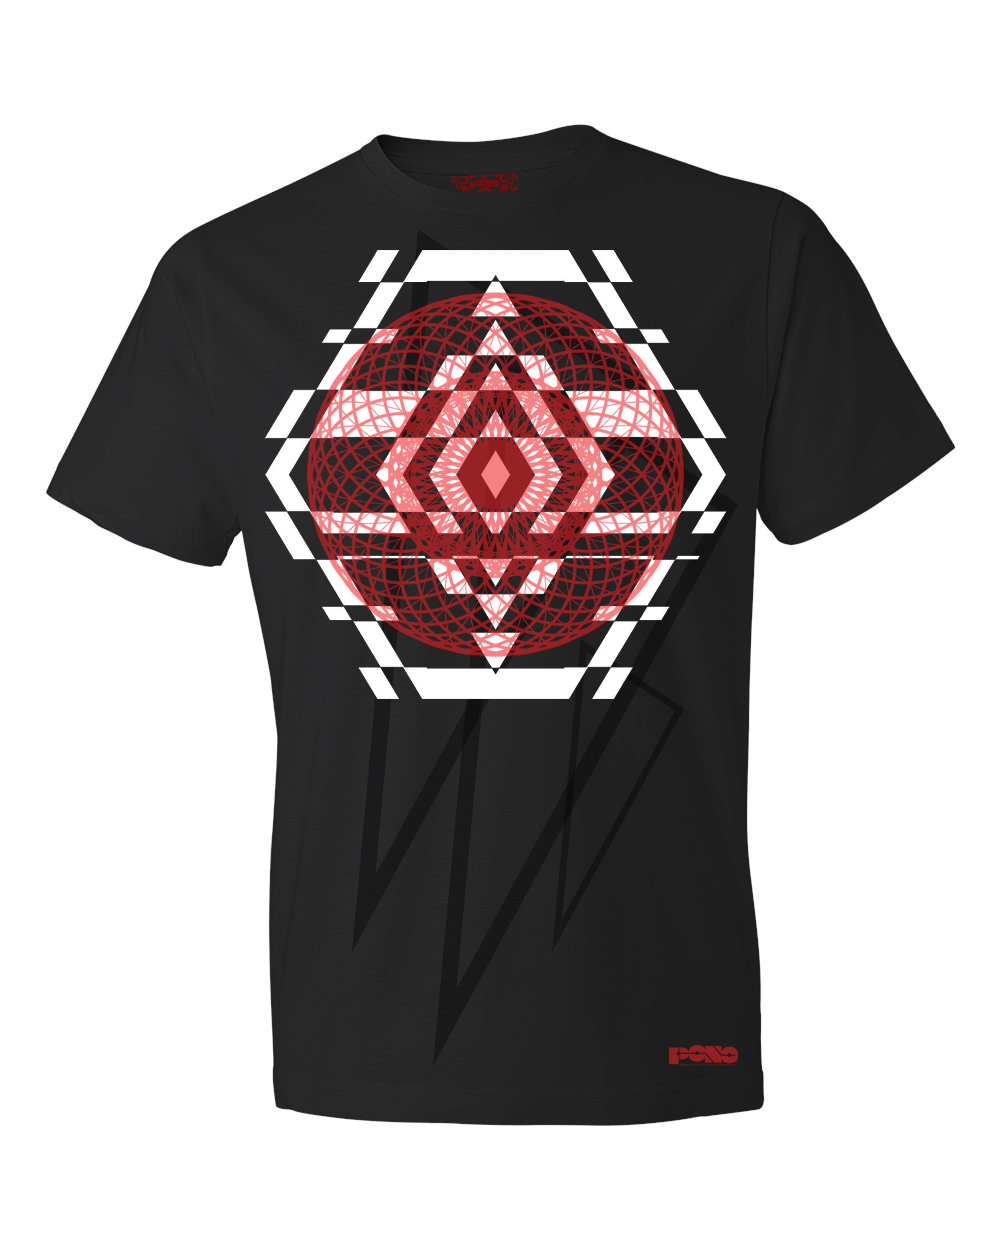 PONO#1-BLACK-GEO RED #3.jpg